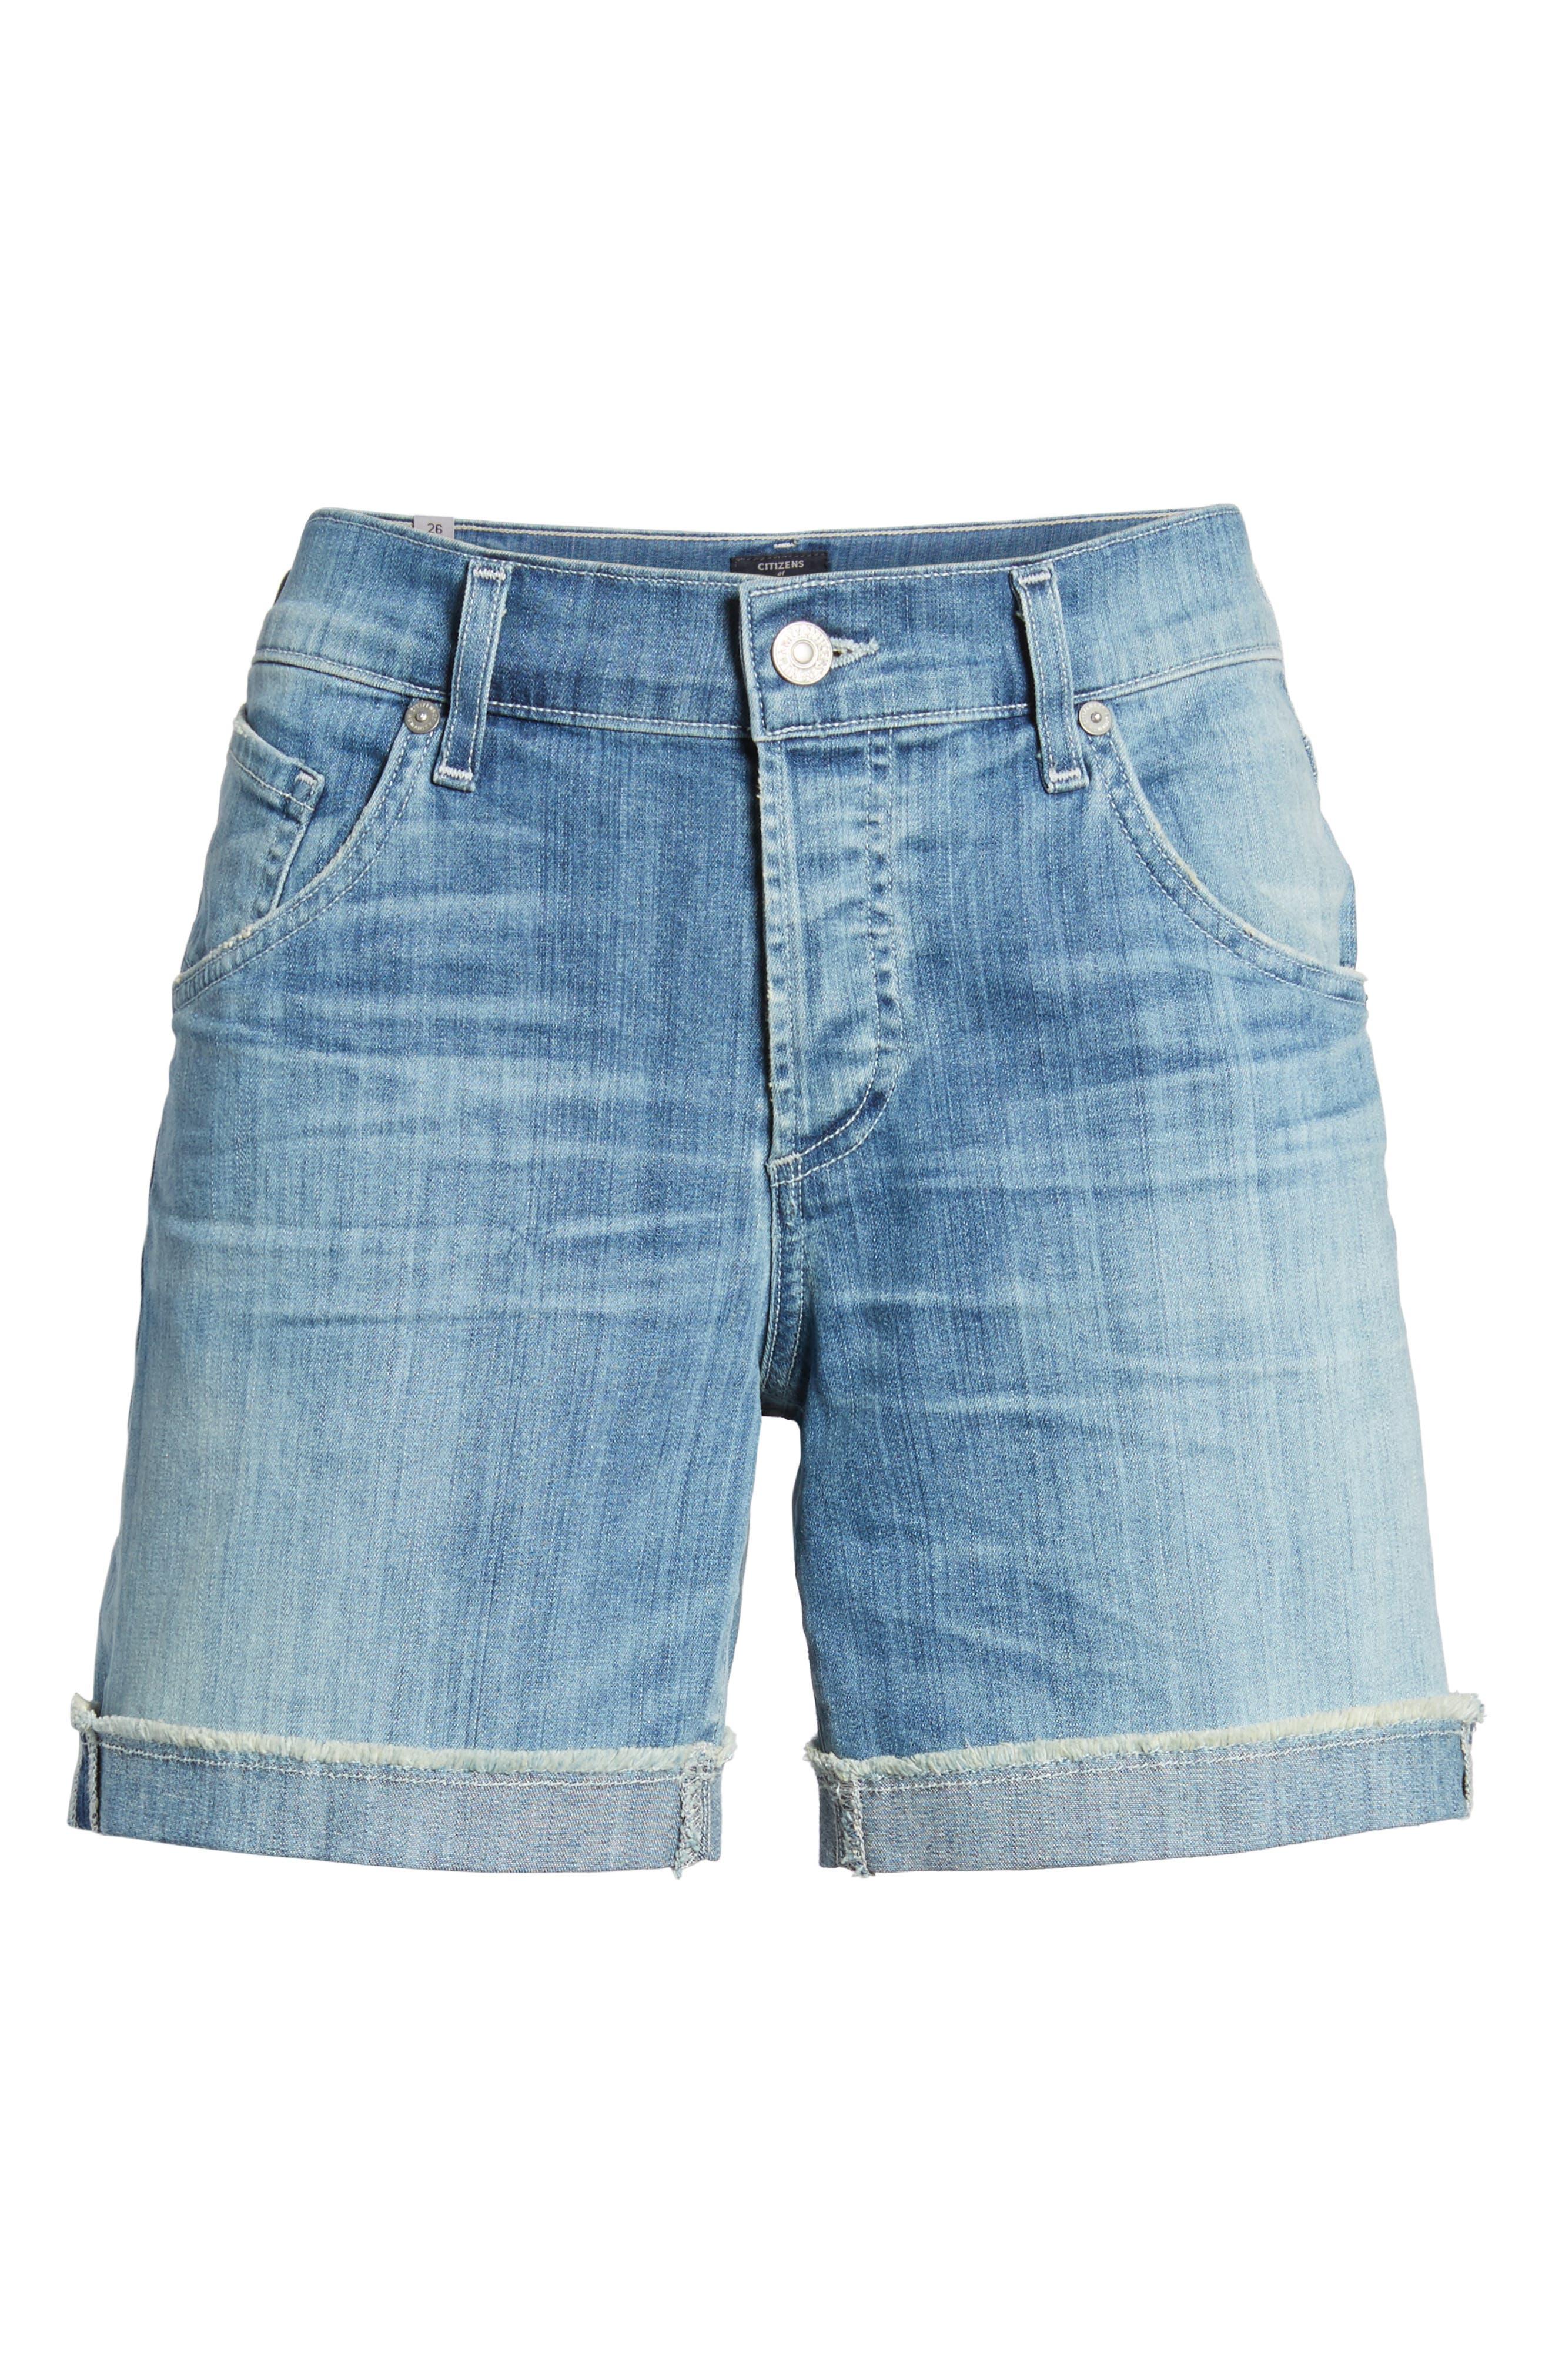 Skyler Denim Shorts,                             Alternate thumbnail 7, color,                             Mercury